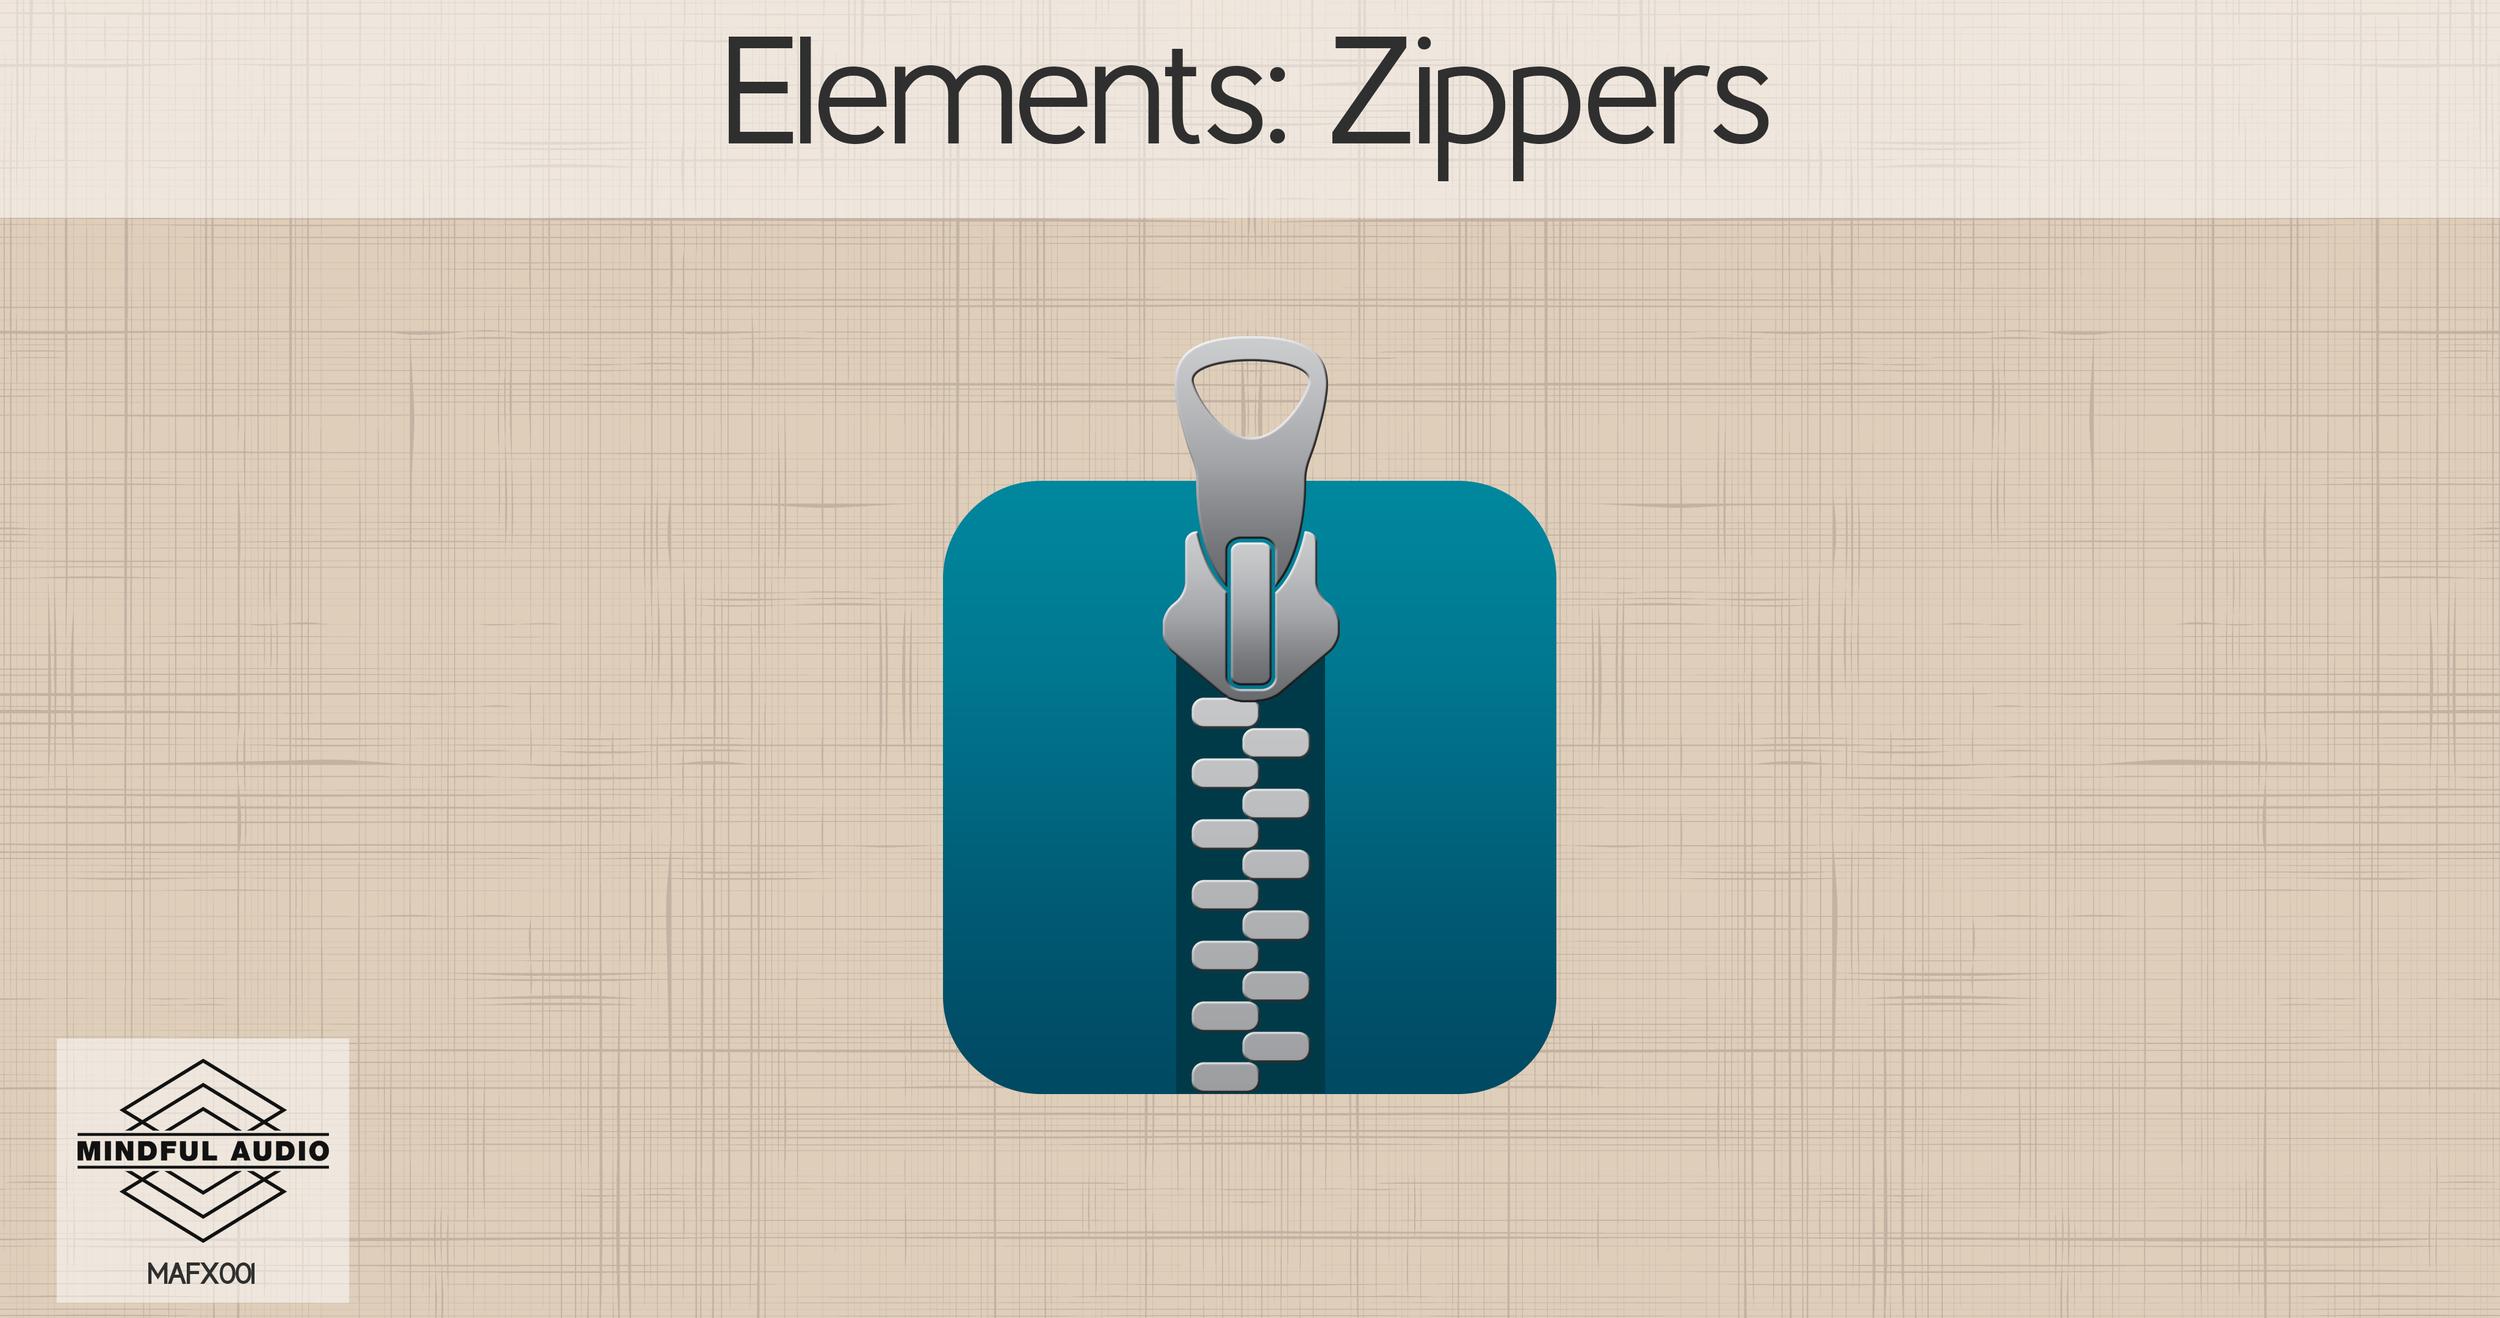 Elements Zippers (Wallpaper).jpg